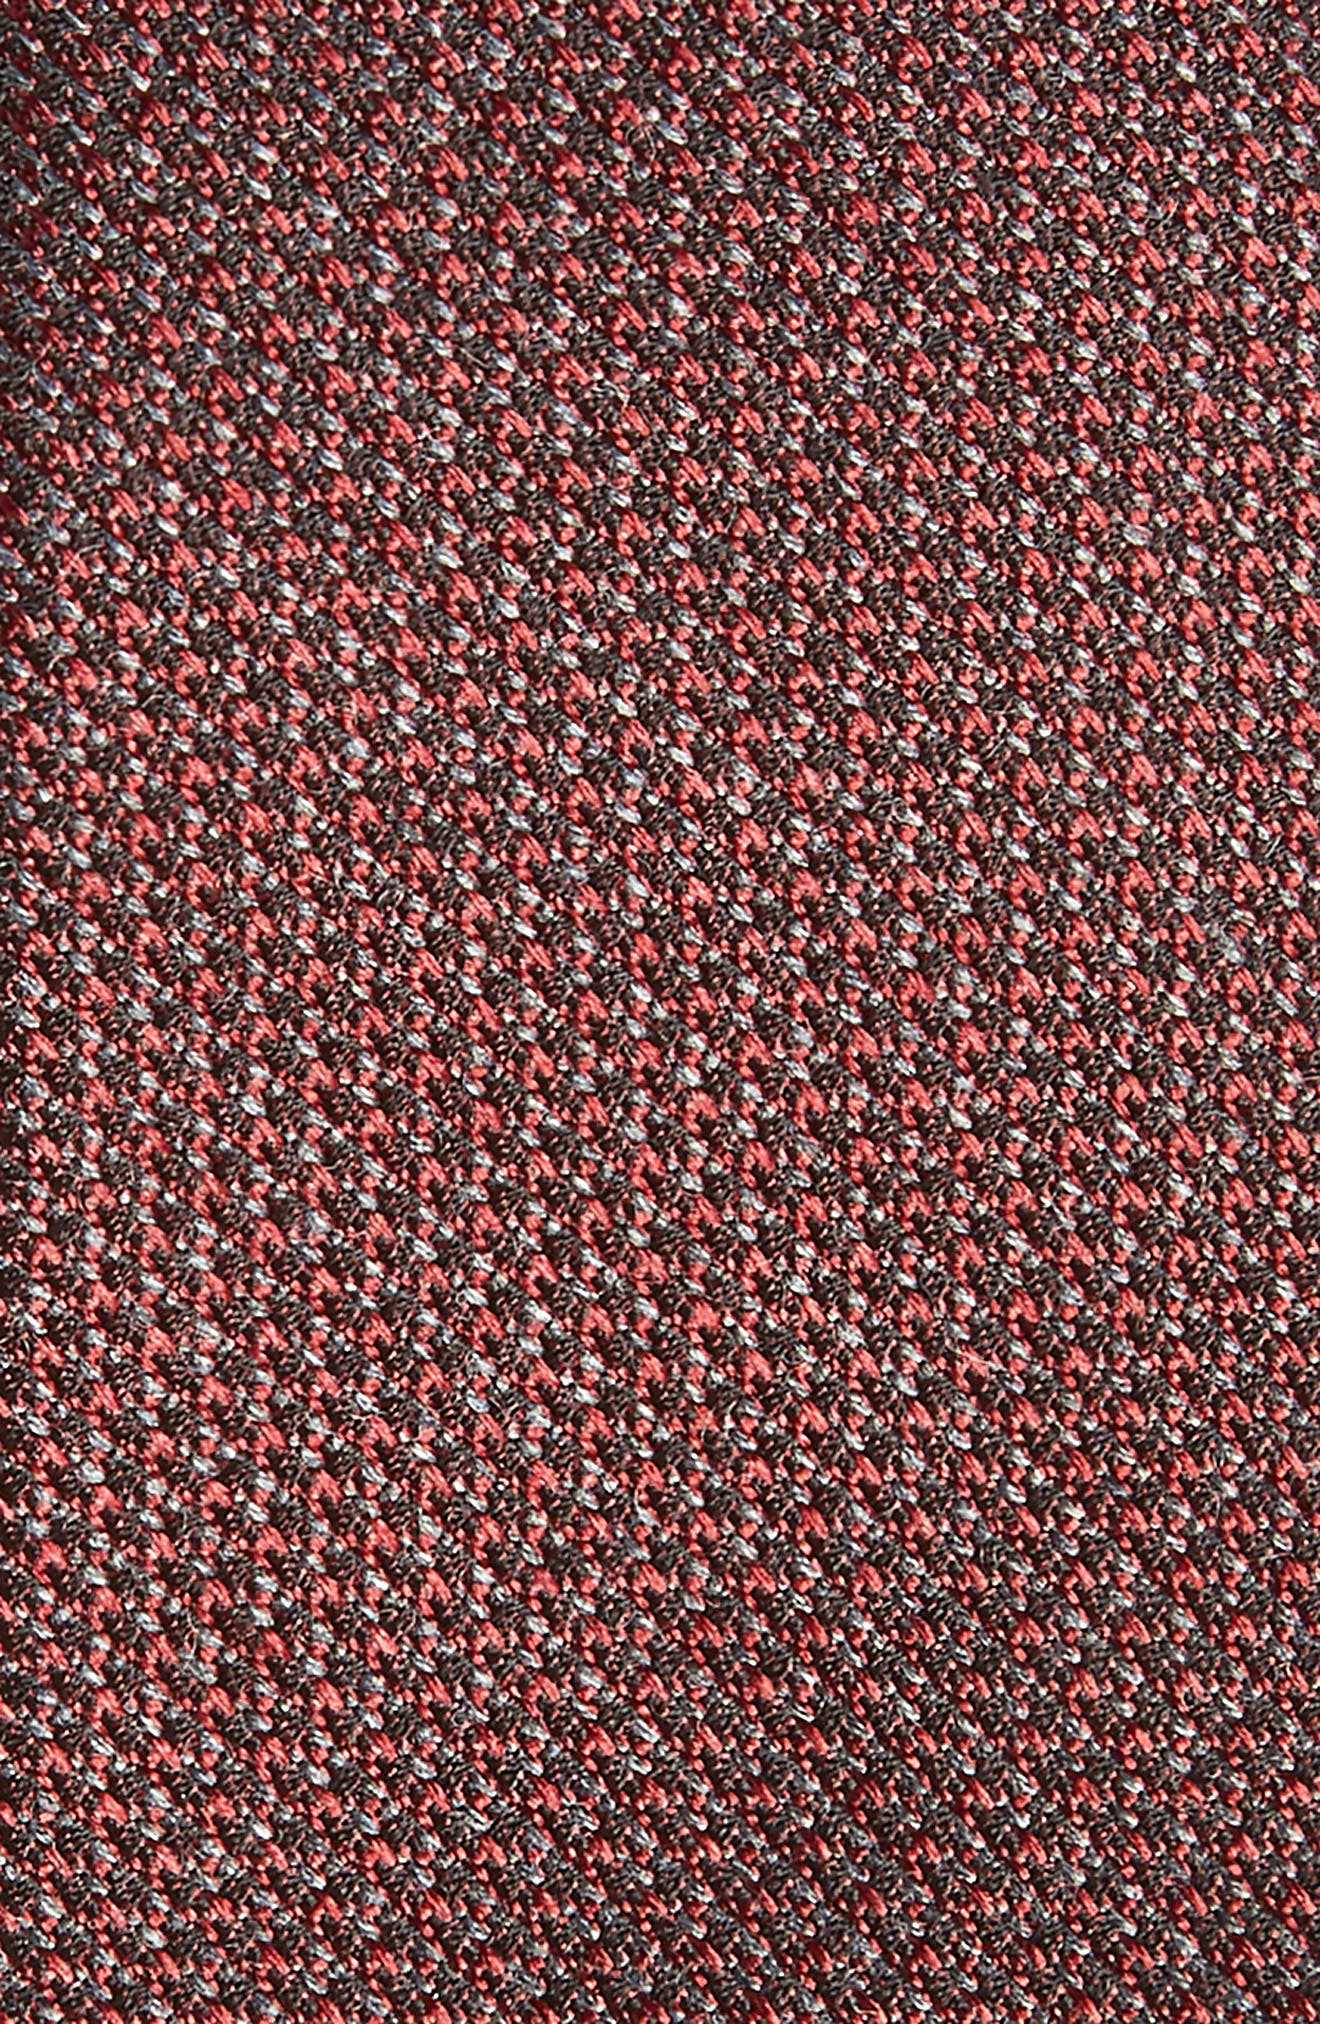 Kenton Textured Silk Blend Skinny Tie,                             Alternate thumbnail 10, color,